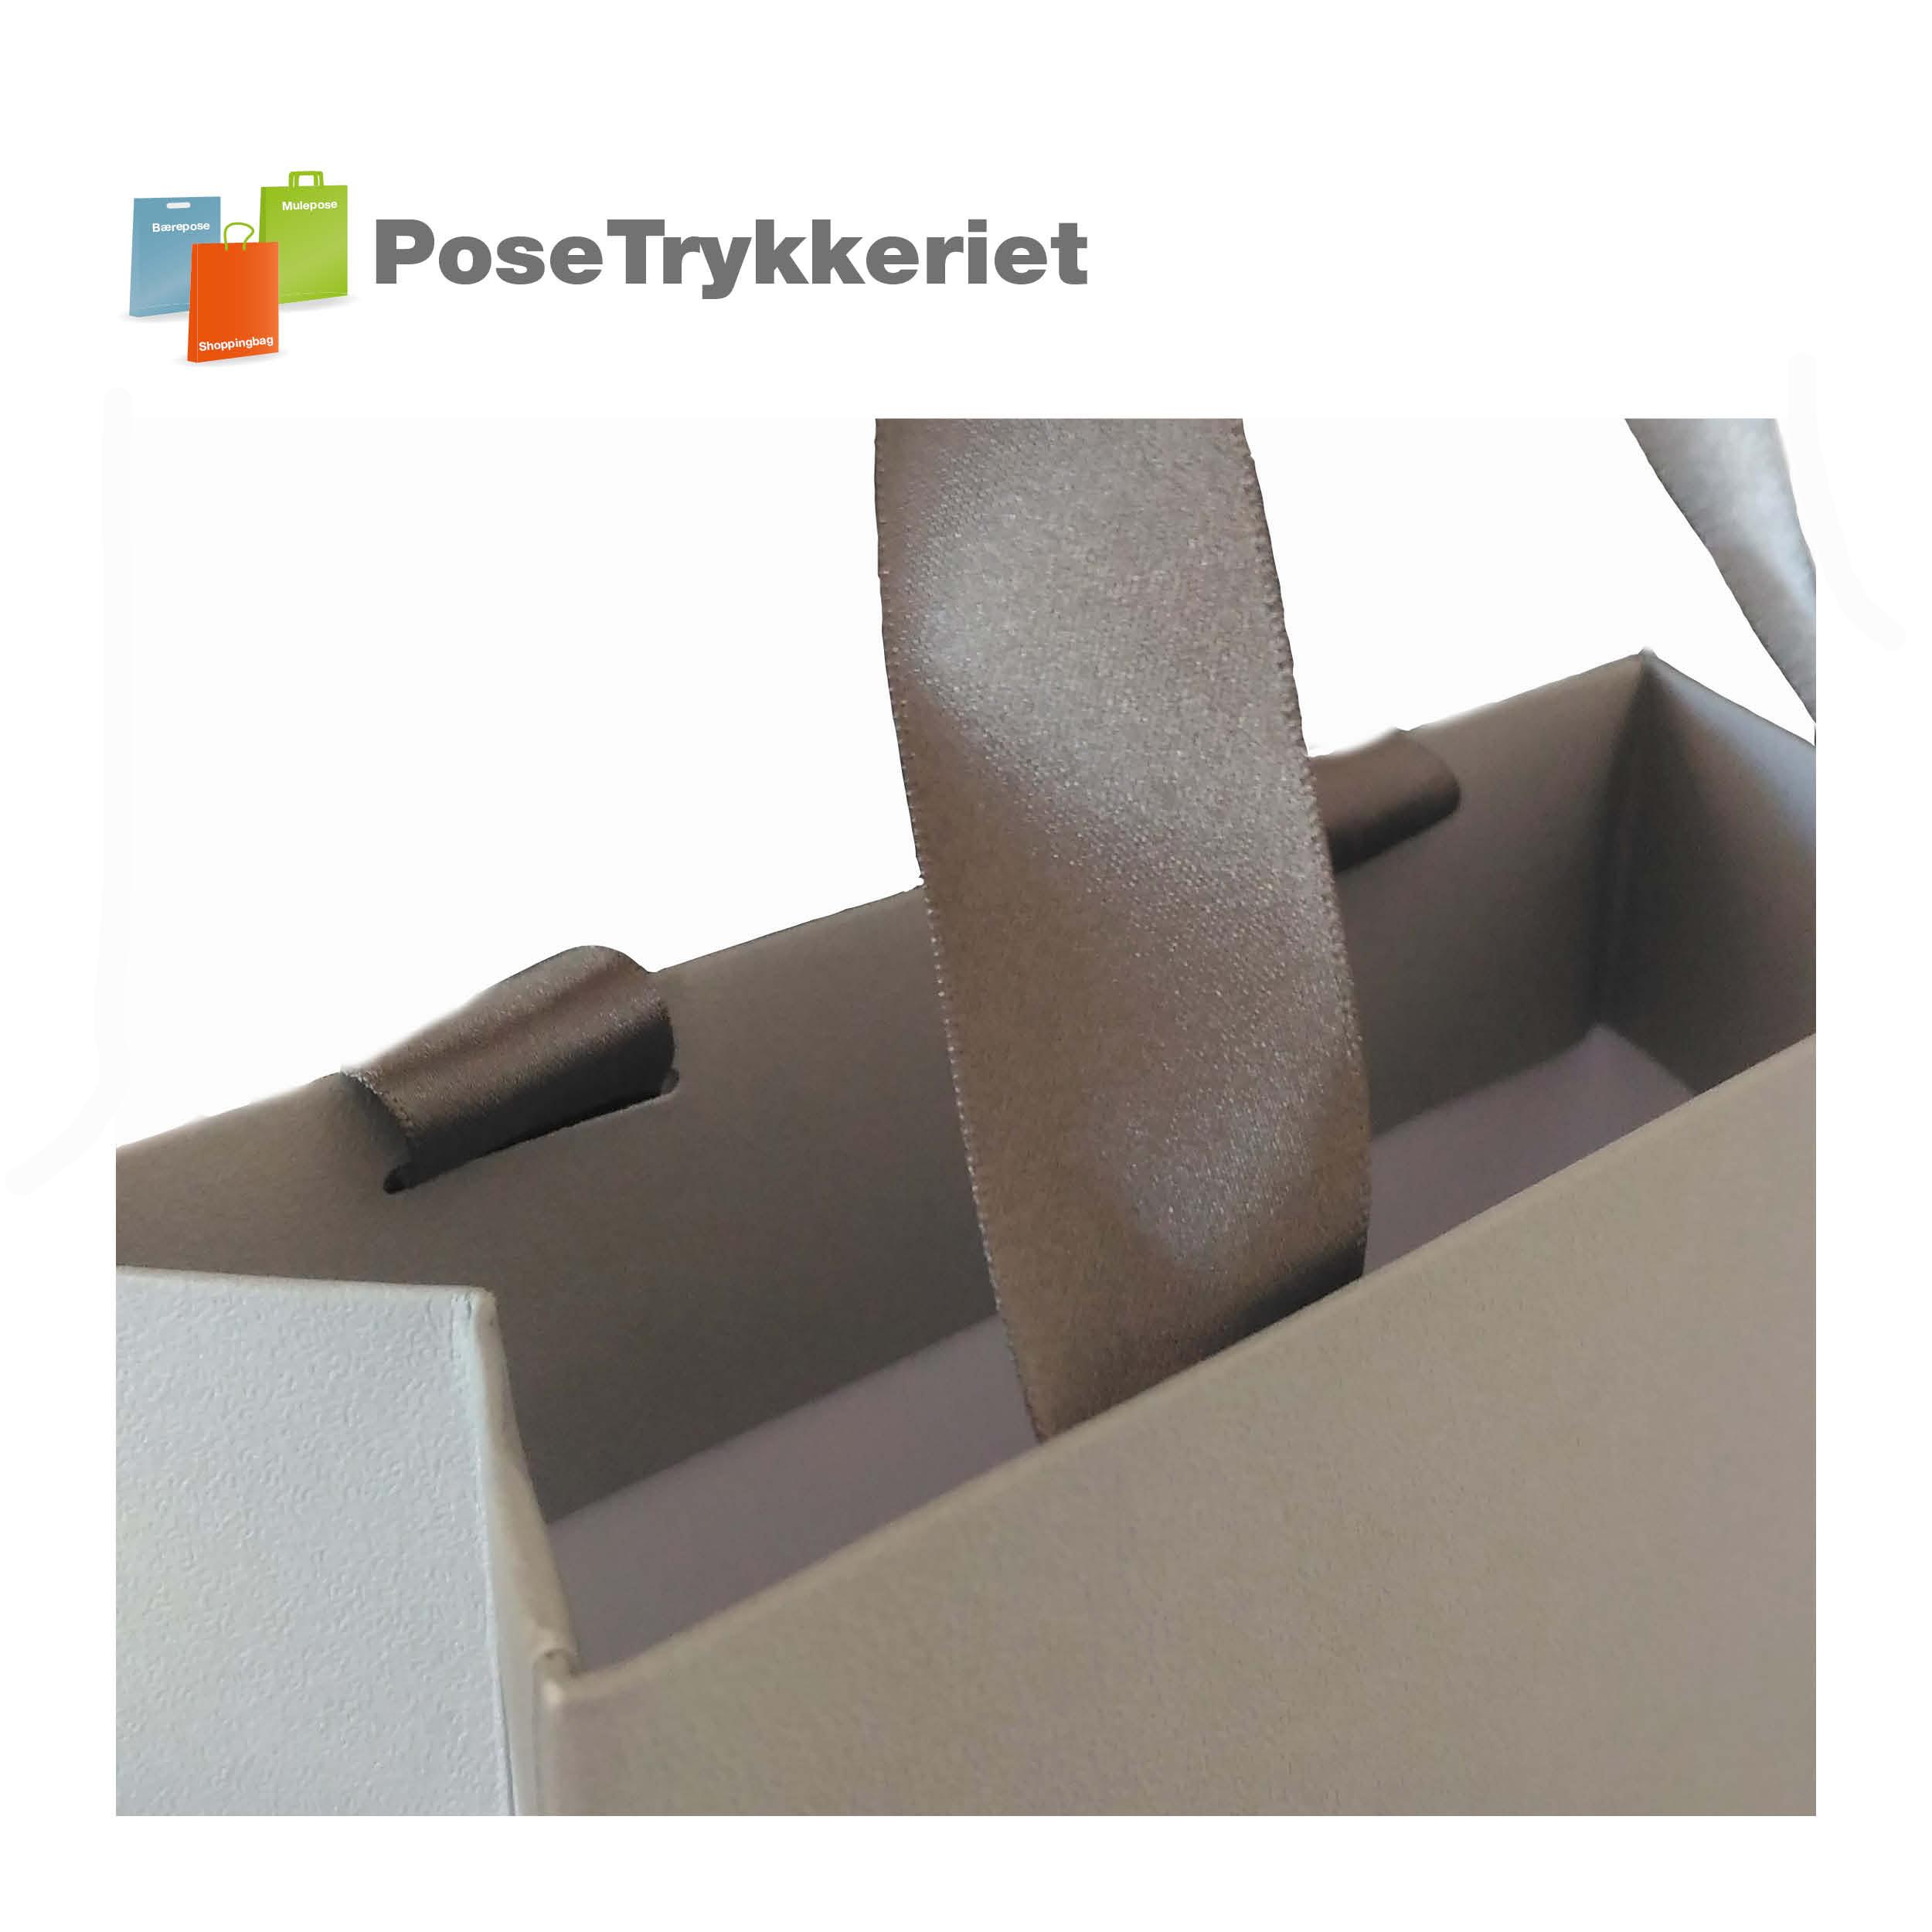 Silkebånd, pålimet. PoseTrykkeriet.dk